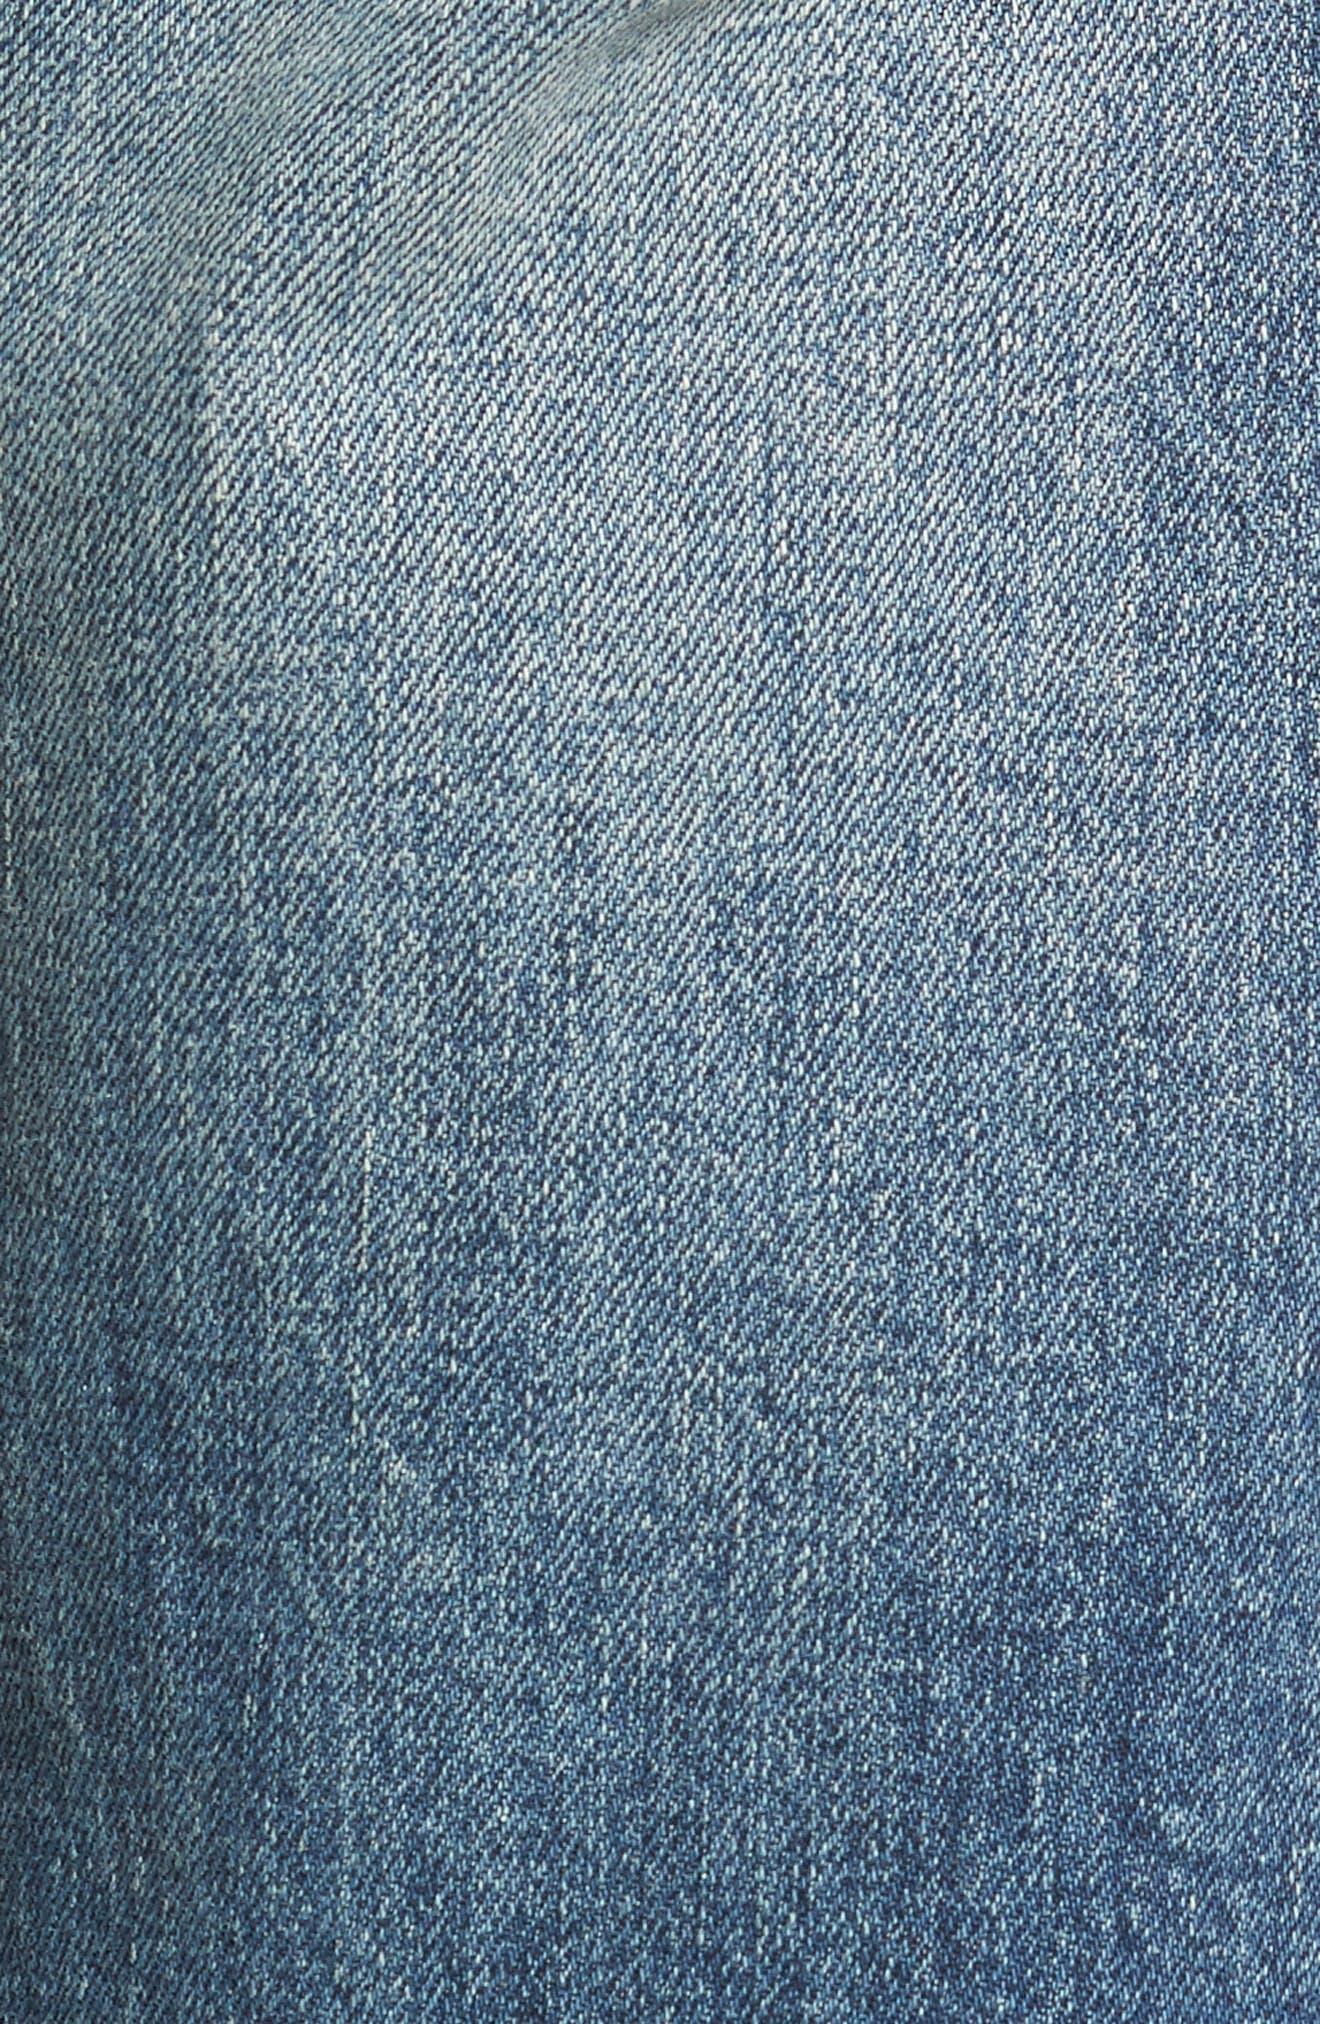 Brixton Slim Straight Fit Jeans,                             Alternate thumbnail 5, color,                             Harken